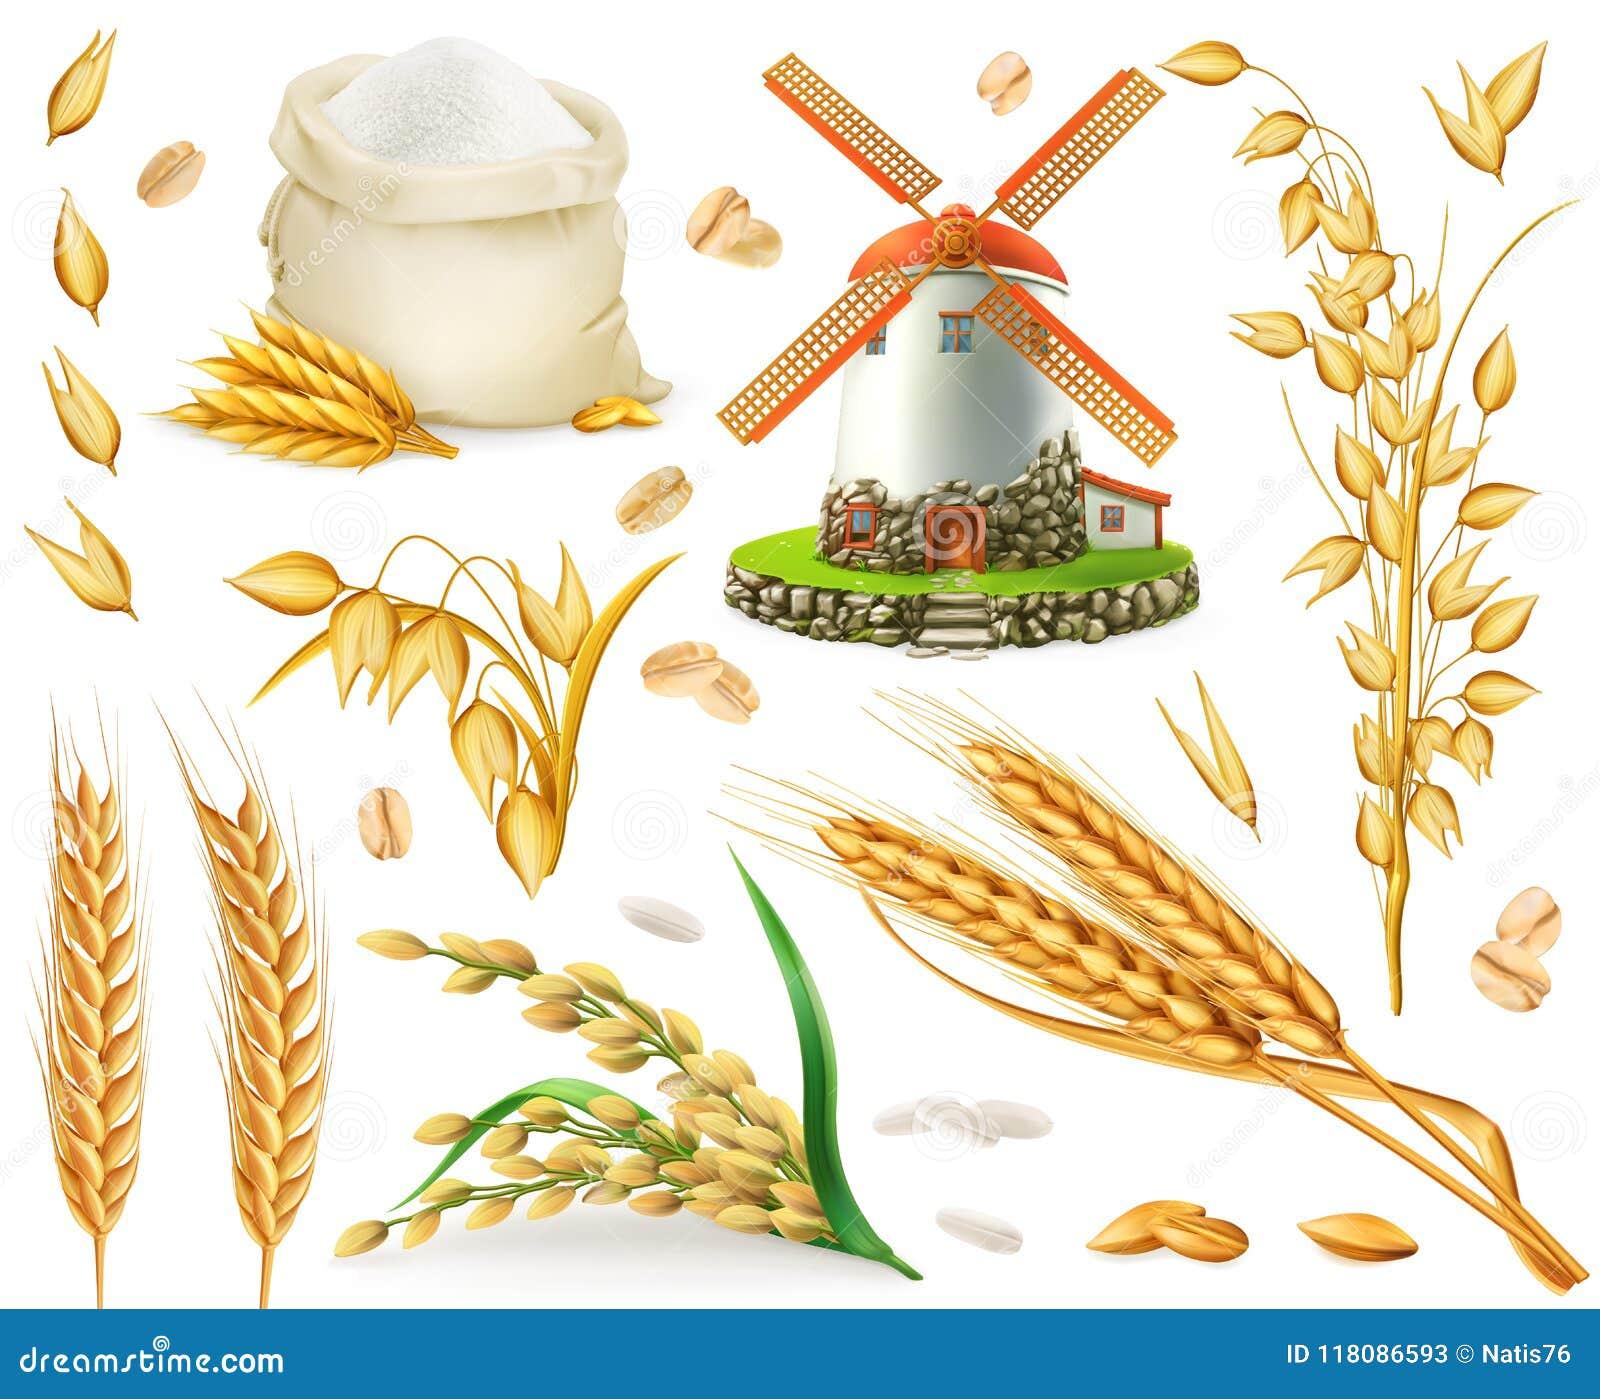 Wheat, rice, oats, barley, flour, mill and grain. 3d vector icon set